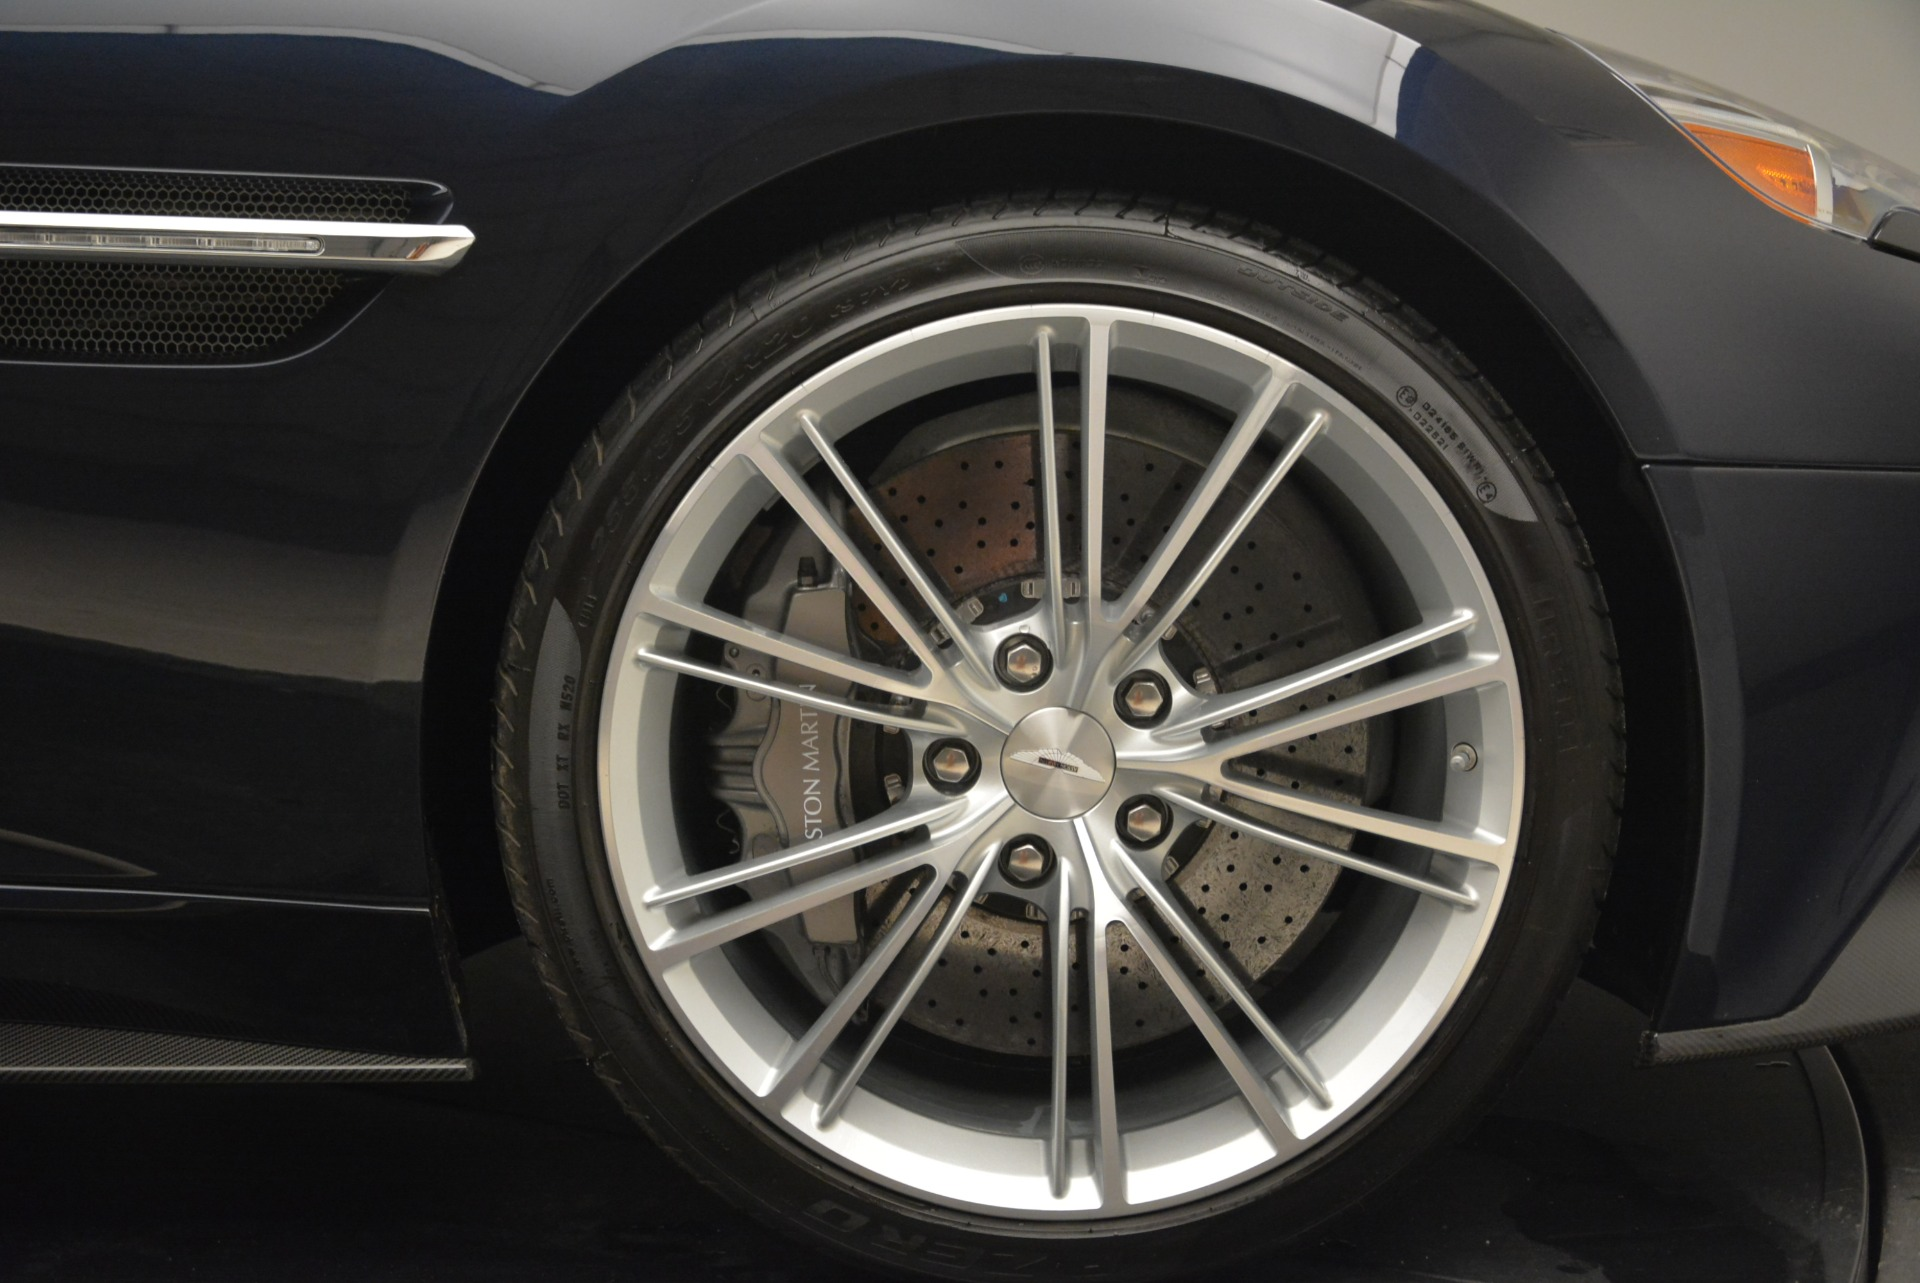 Used 2014 Aston Martin Vanquish Volante For Sale In Westport, CT 2097_p28